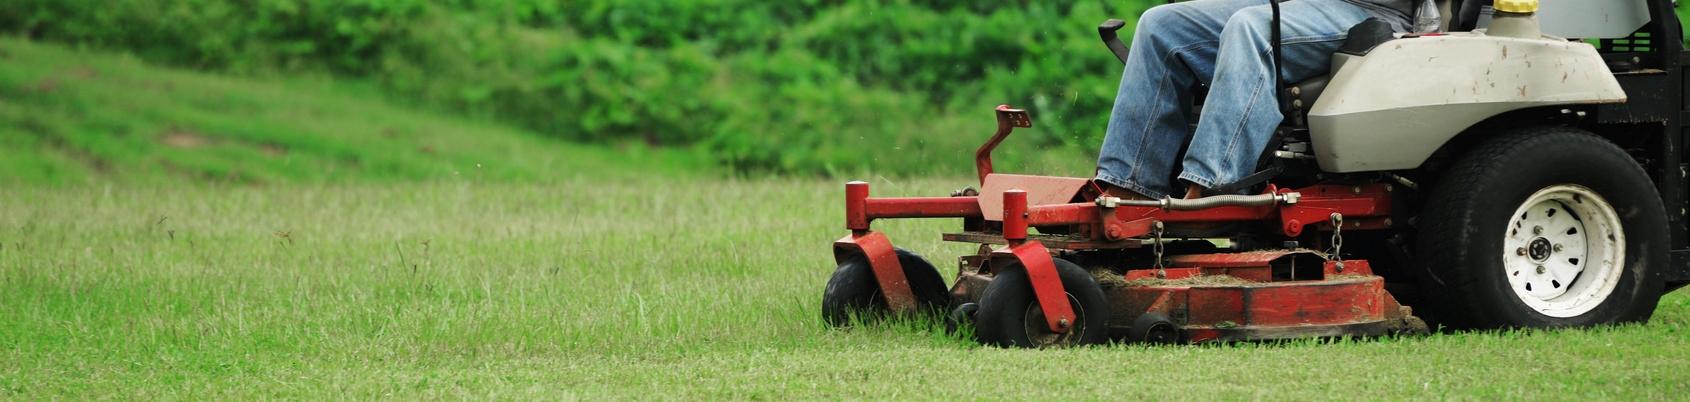 Lawn Maintenance Springfield MO